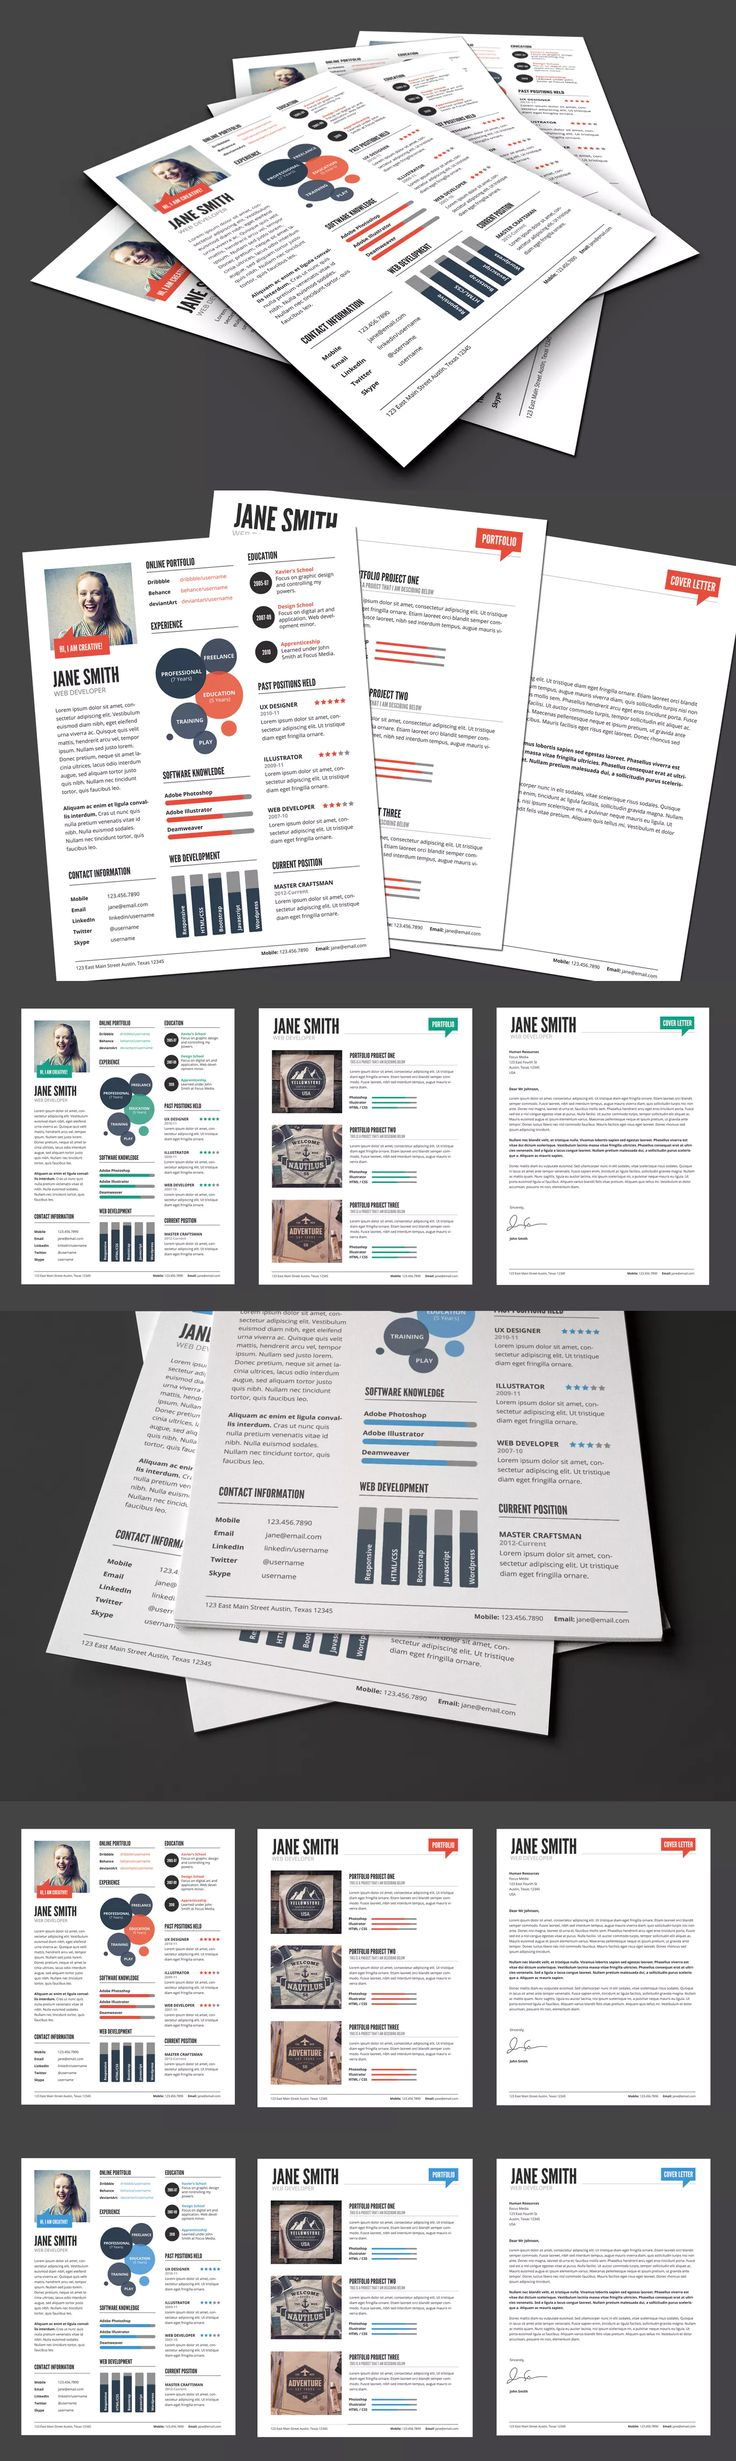 85 best Resume / CV Design Templates images on Pinterest ...